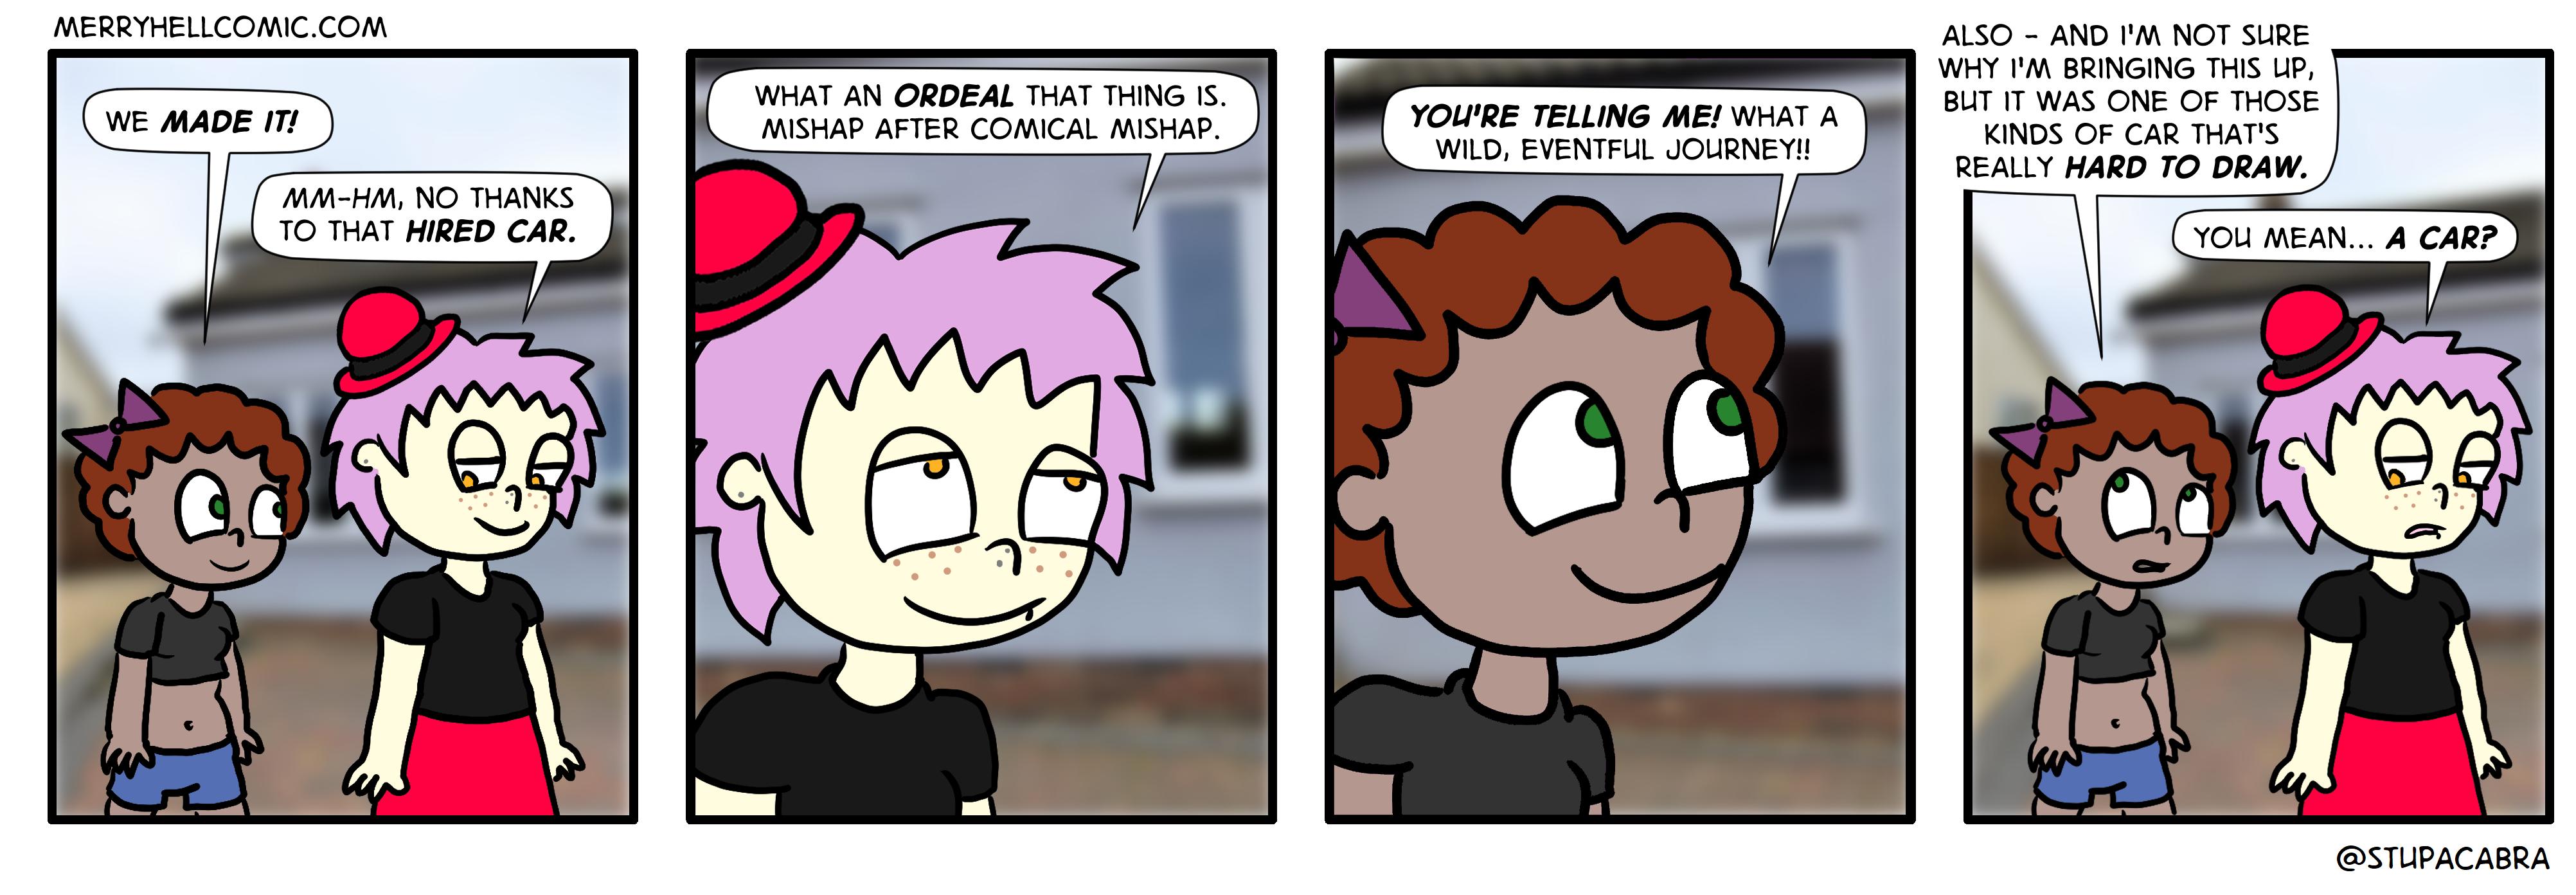 358. Comical mishap